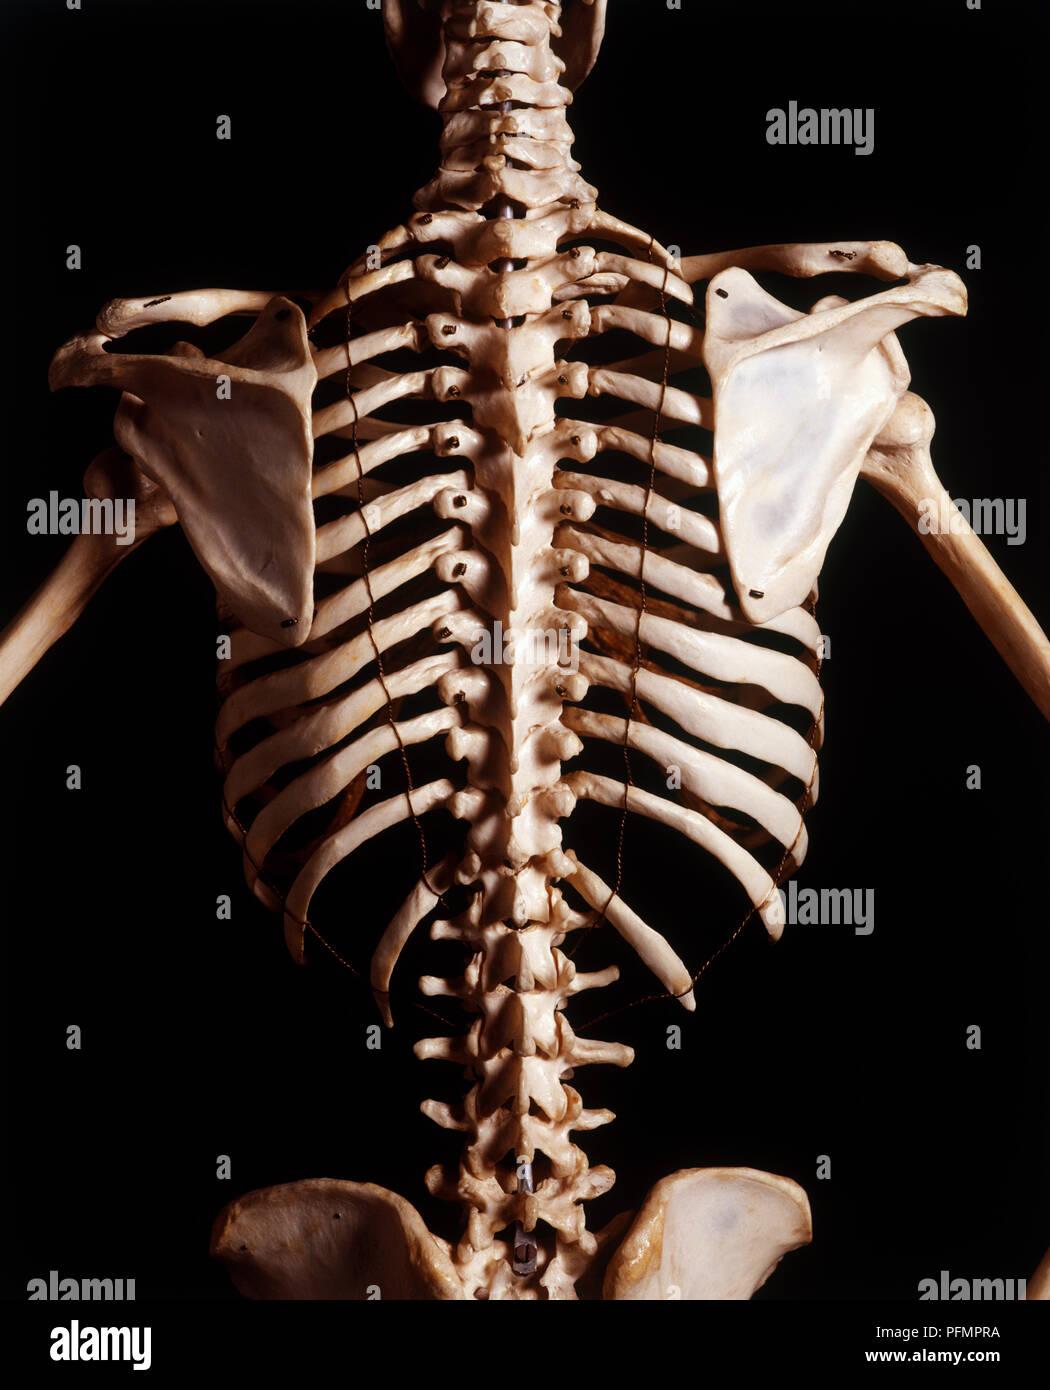 Human Skeleton Rib Cage And Shoulder Blades High Angle View Stock